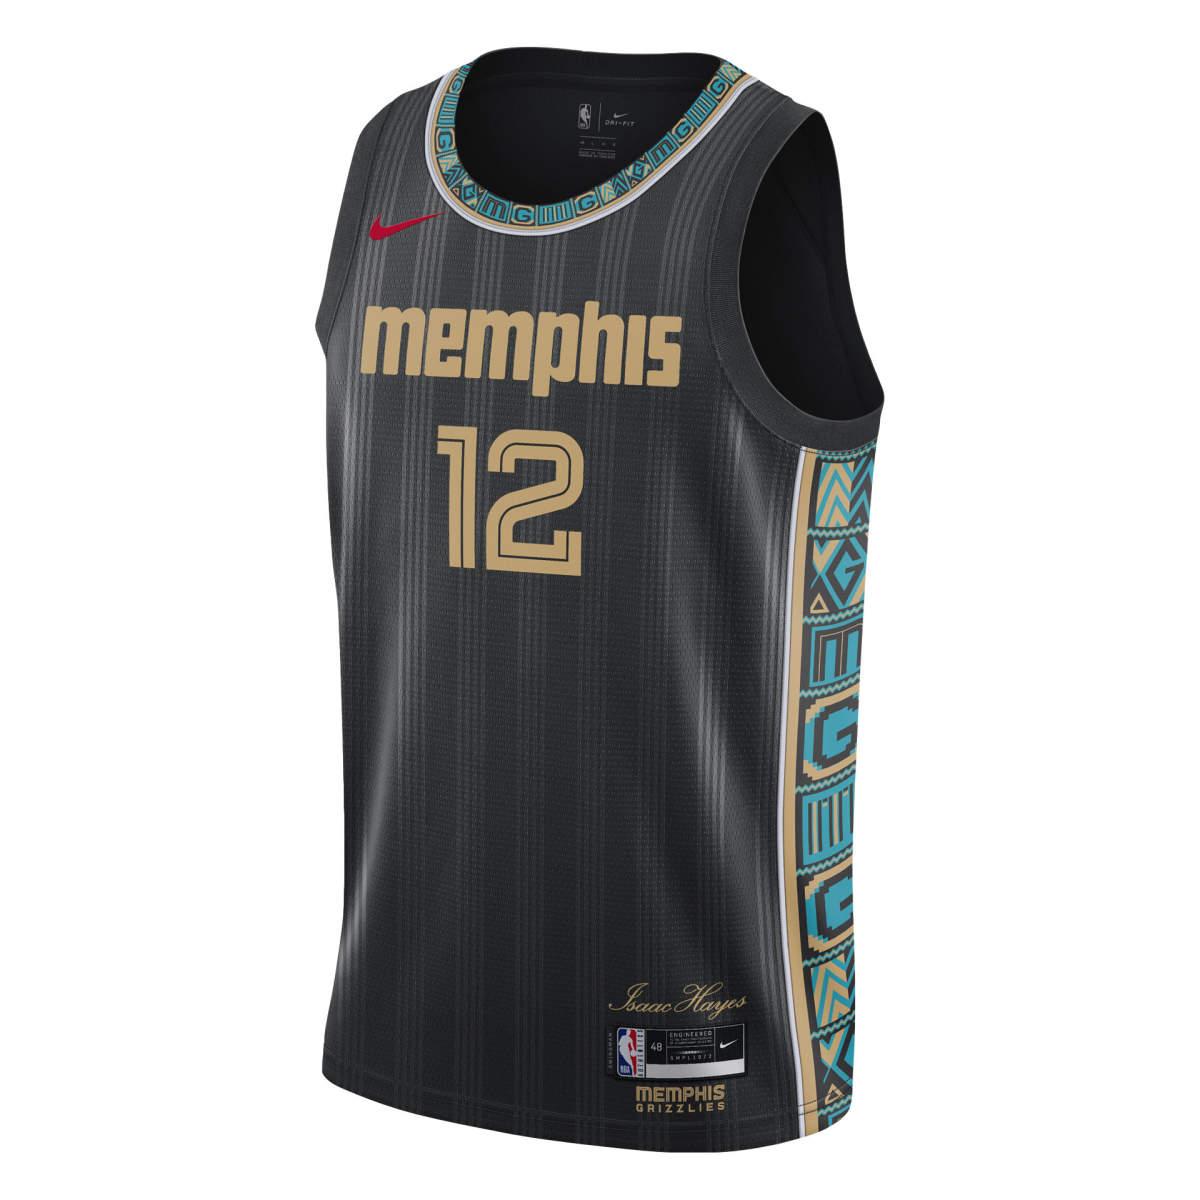 Memphis grizzlies ce swingman jersey morant